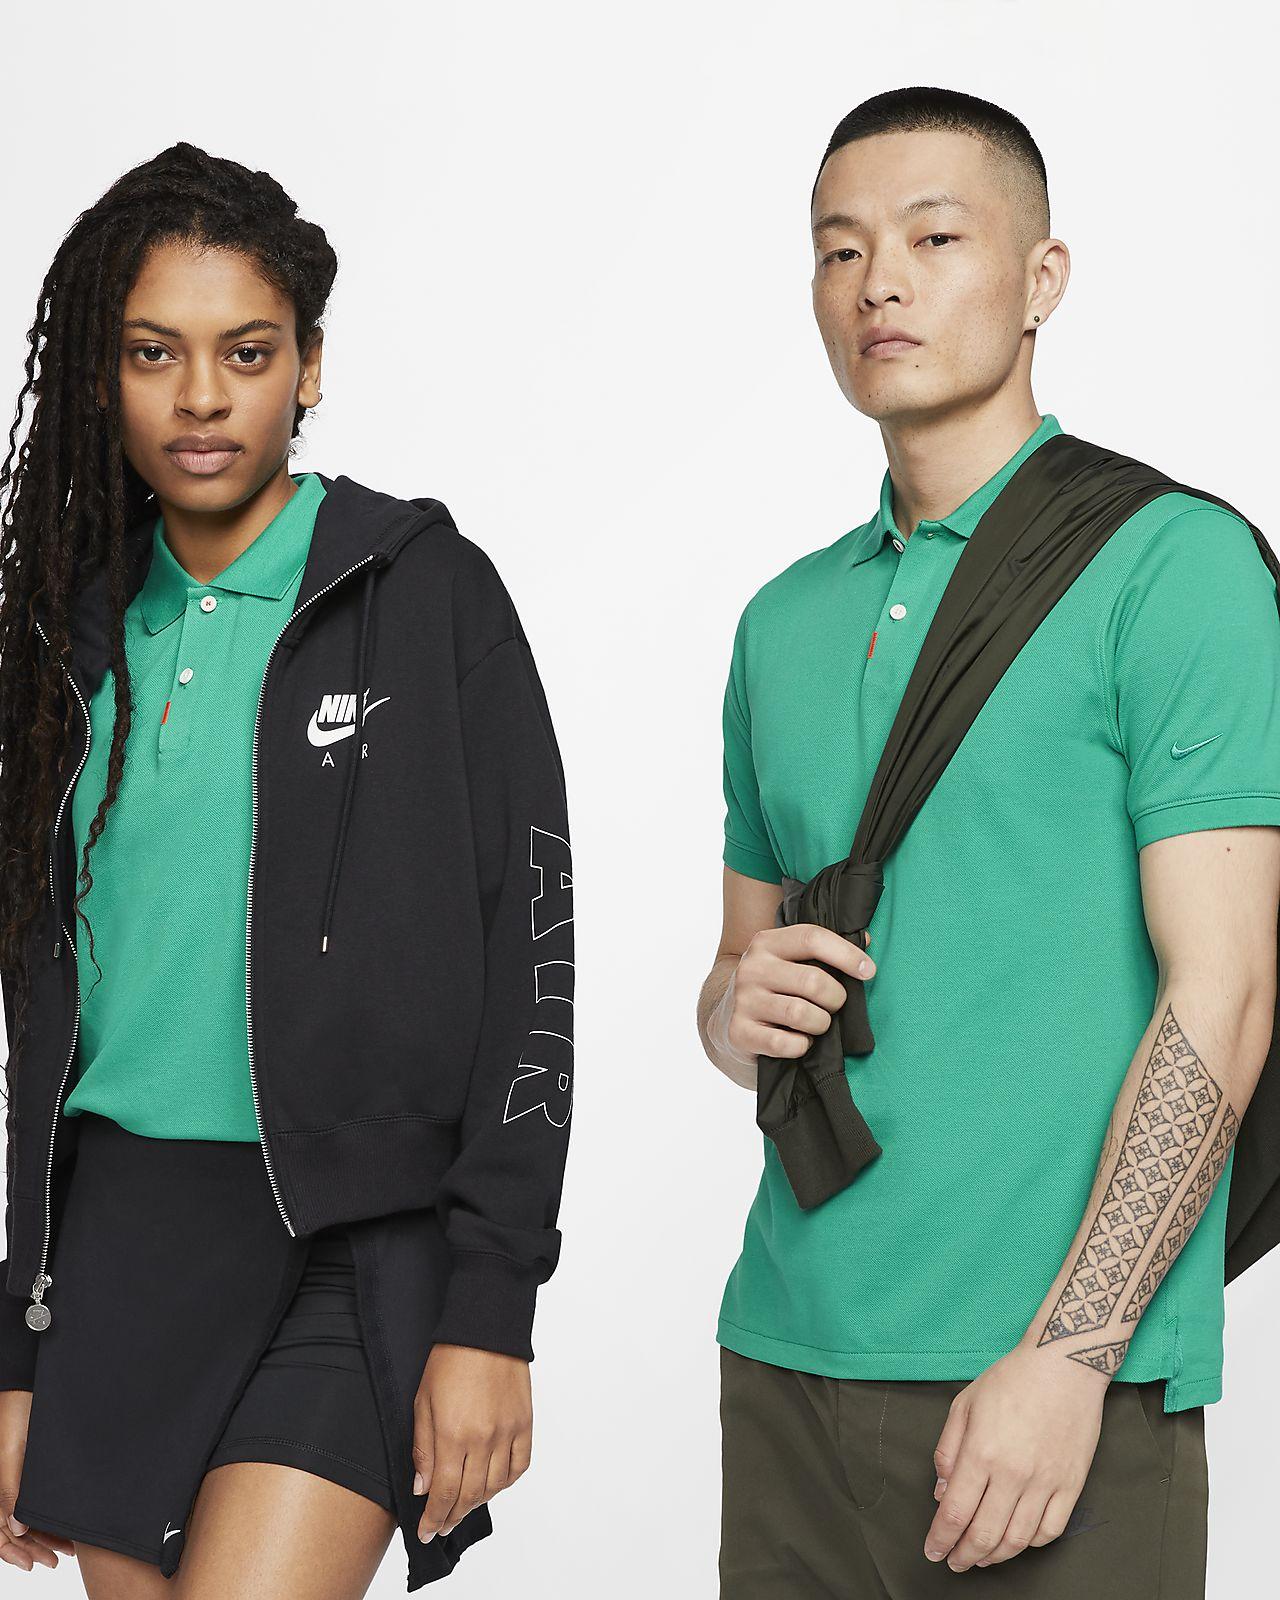 Pikétröja The Nike Polo unisex med smal passform